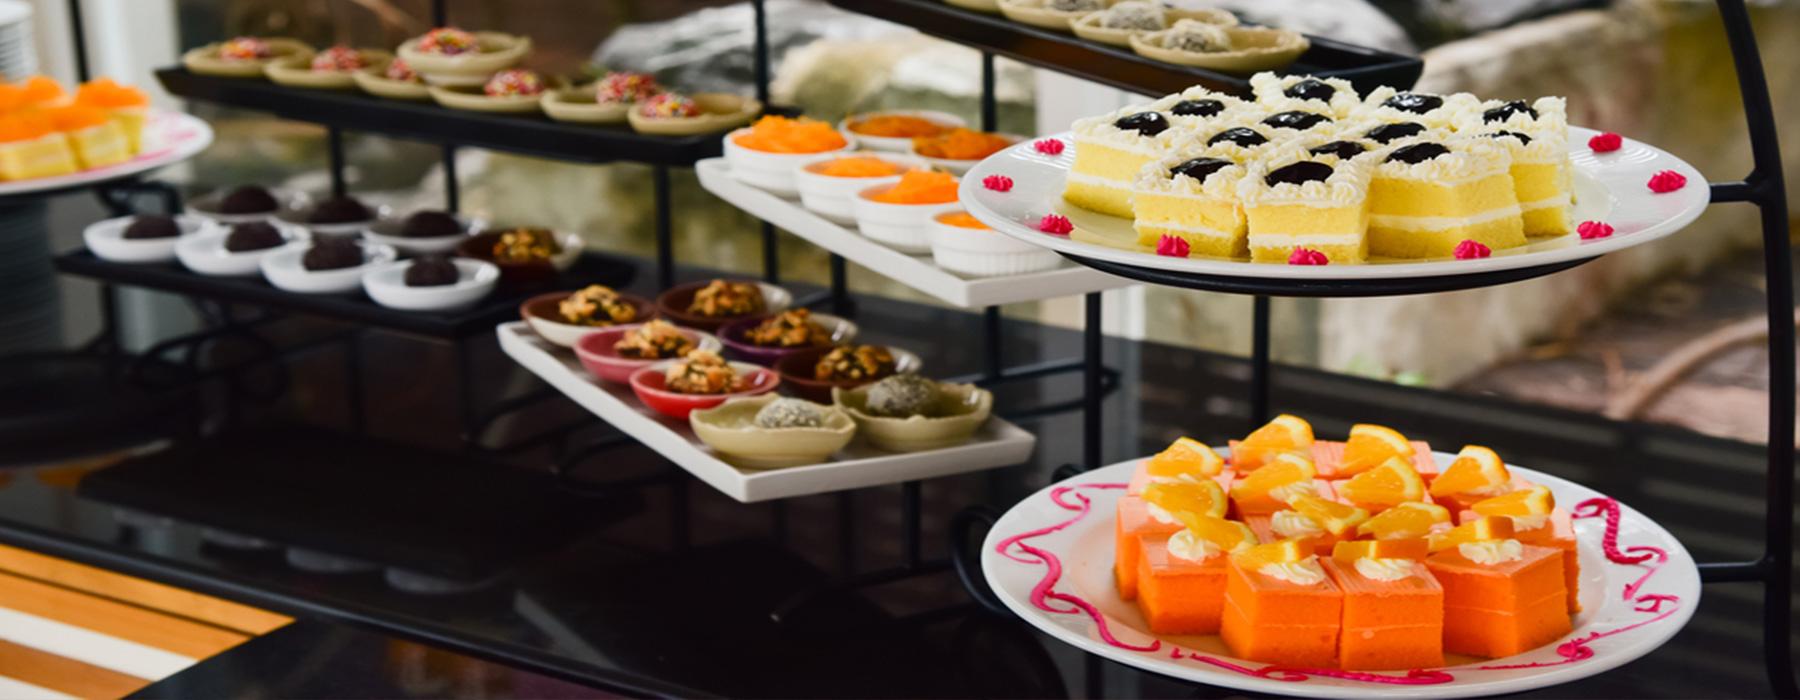 Desserts in the Desi sweet Centre Bradford